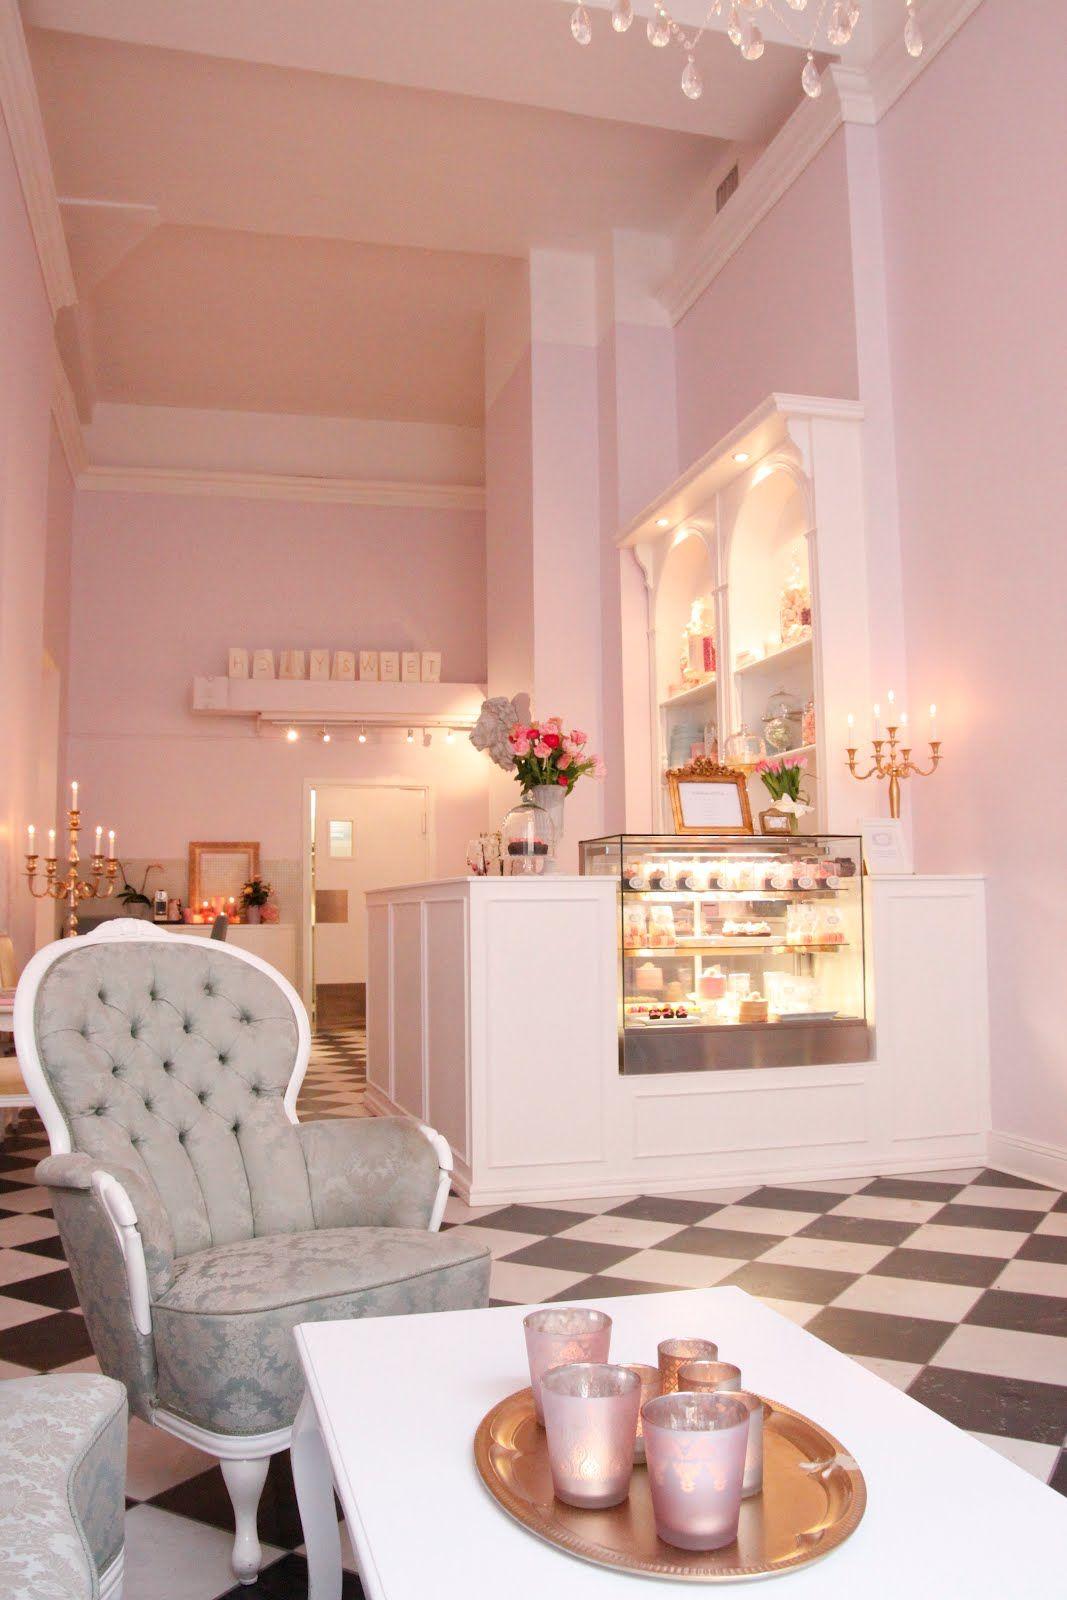 ondernemingsplan coffeeshop o´holy sweet! More | SweetsTable ondernemingsplan interieur  ondernemingsplan coffeeshop